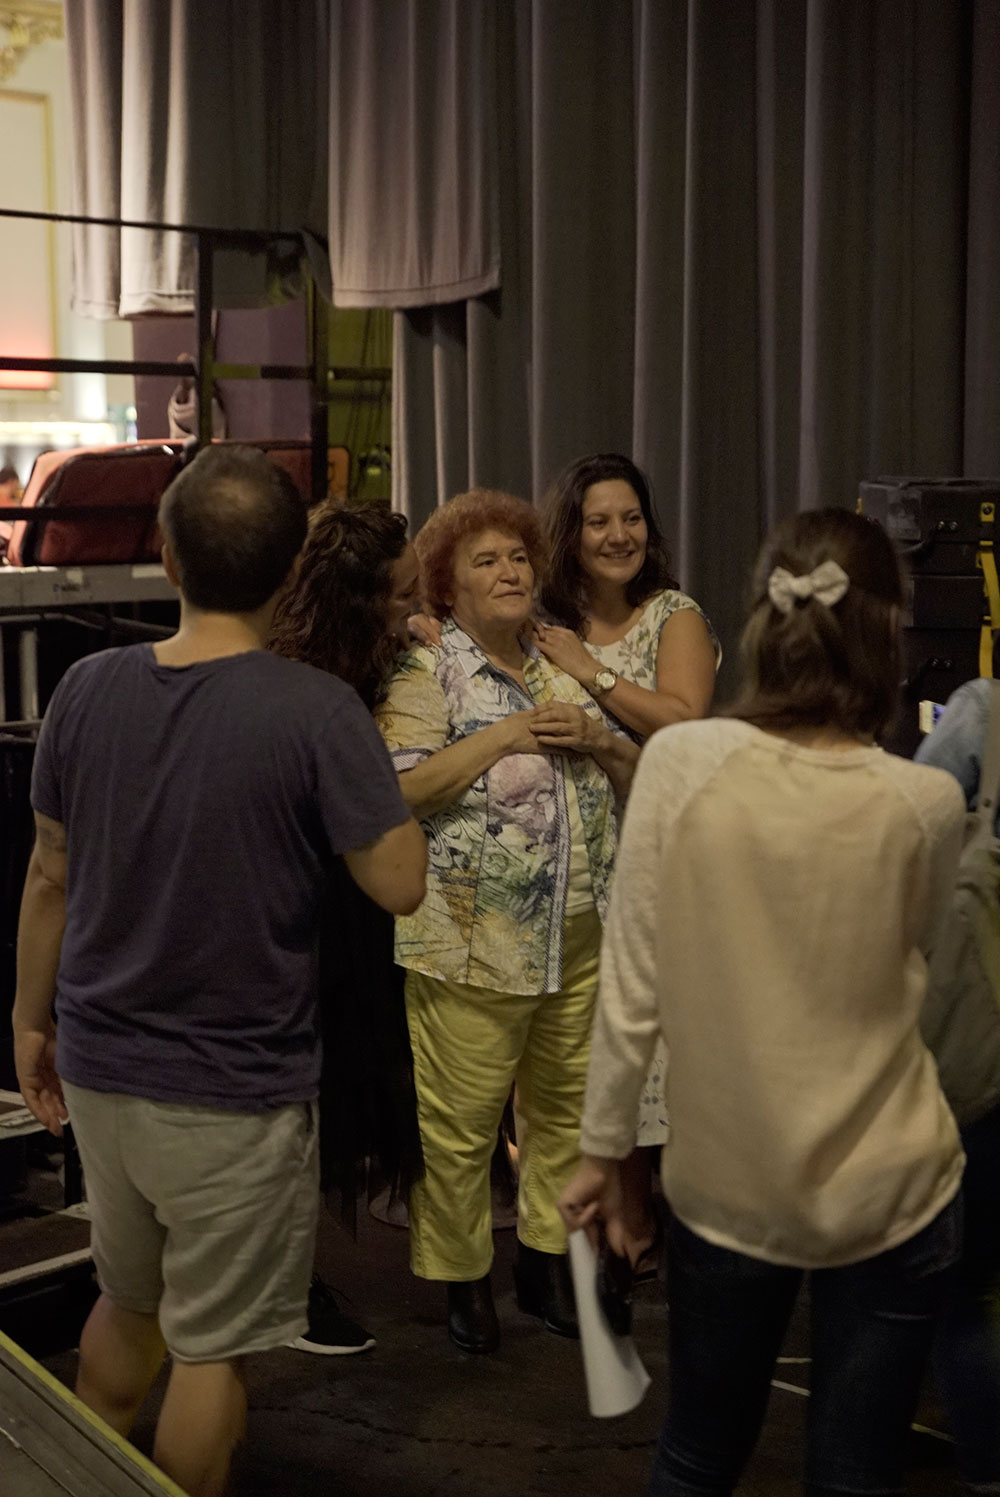 Selda Bağcan & Fans at Pop-Kultur Festival by Thomas Venker